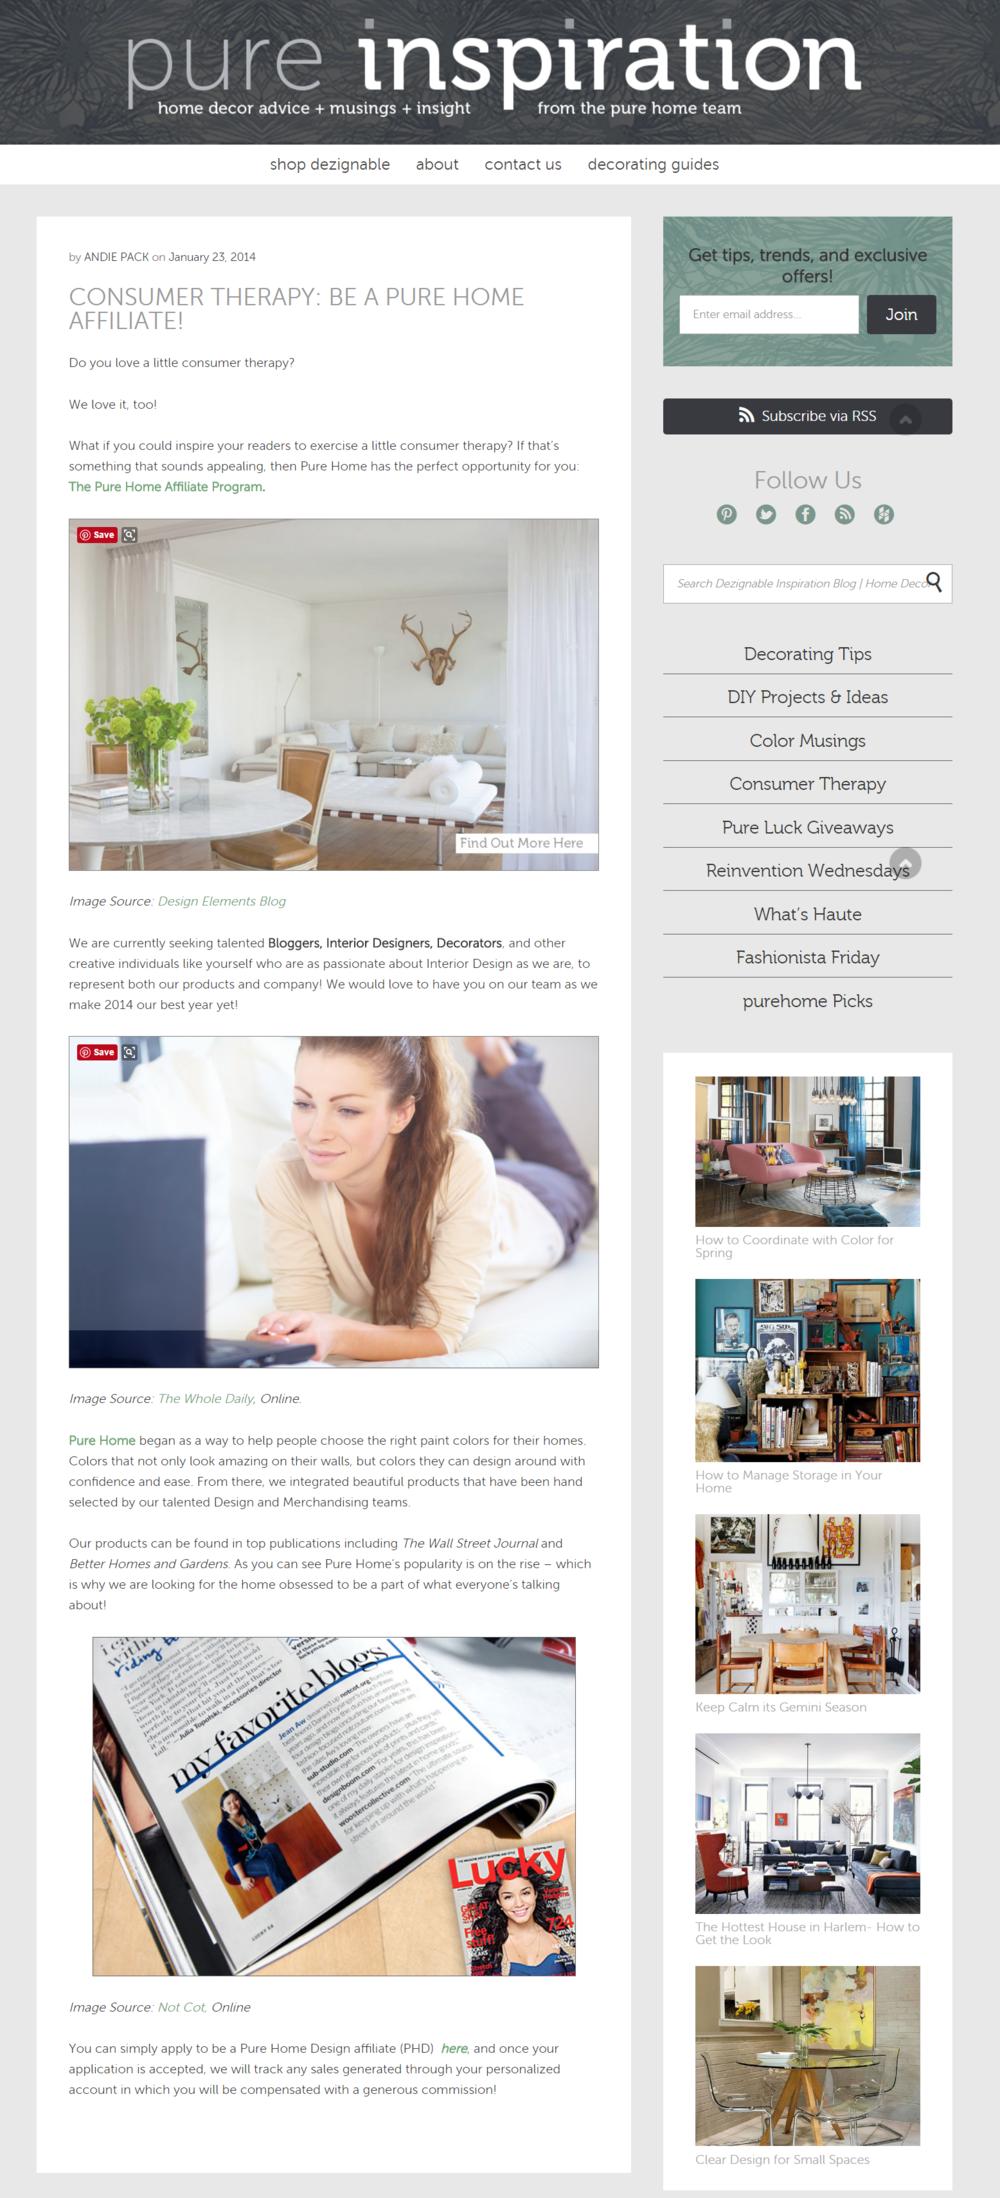 FireShot Capture 21 - Consumer Therapy_ Be_ - http___shop.dezignable.com_blog_2014_affiliate-program.png